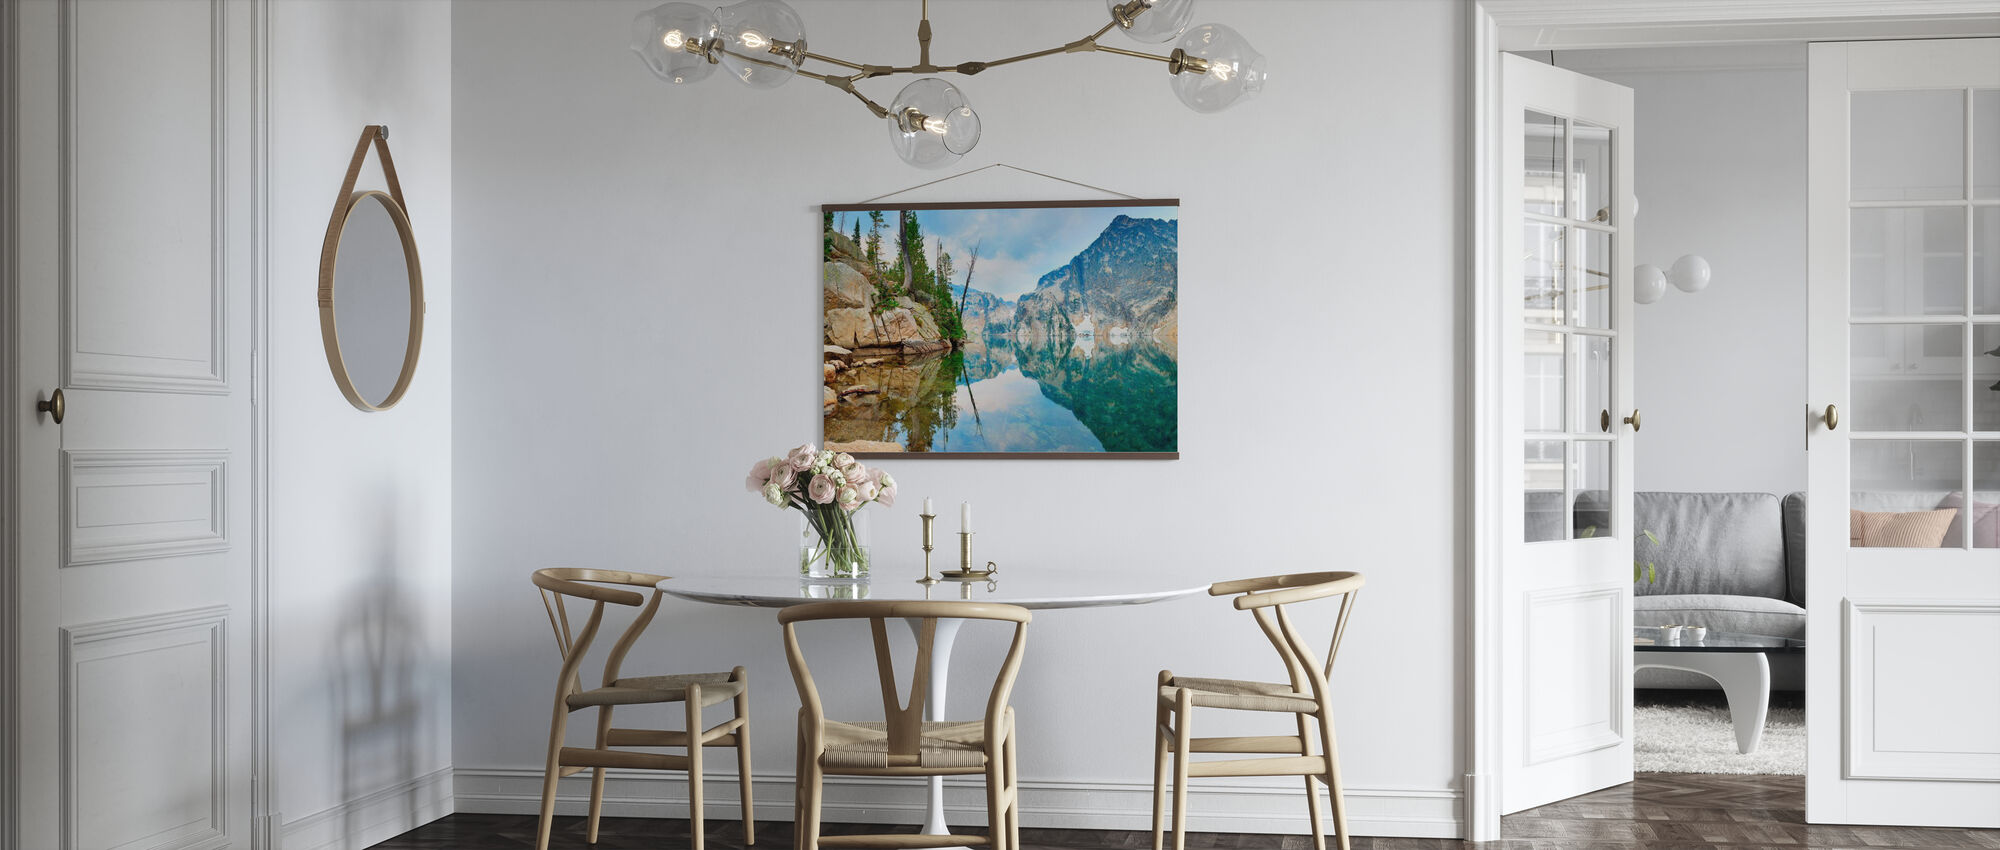 Mountain Lake with Mirror Reflection - Poster - Kitchen